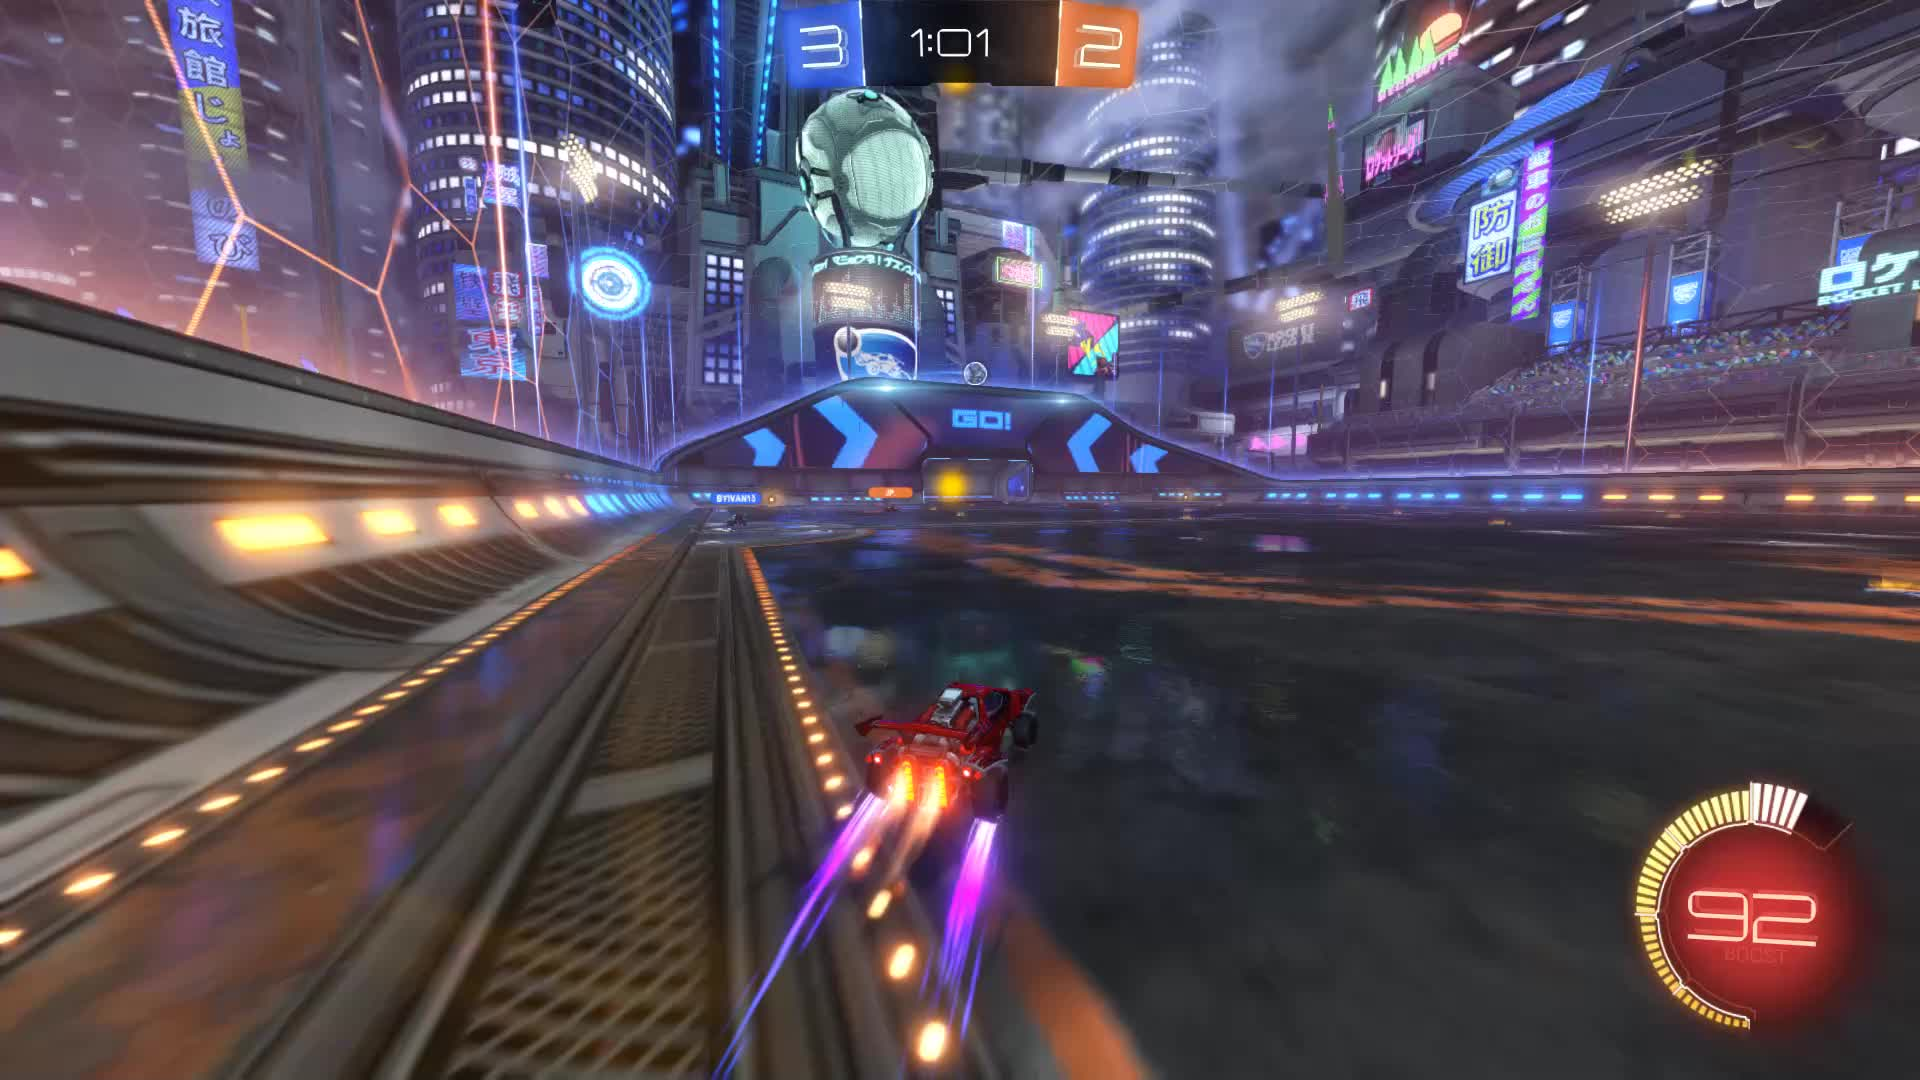 Gif Your Game, GifYourGame, Goal, Rocket League, RocketLeague, Squash, Goal 6: Squash GIFs